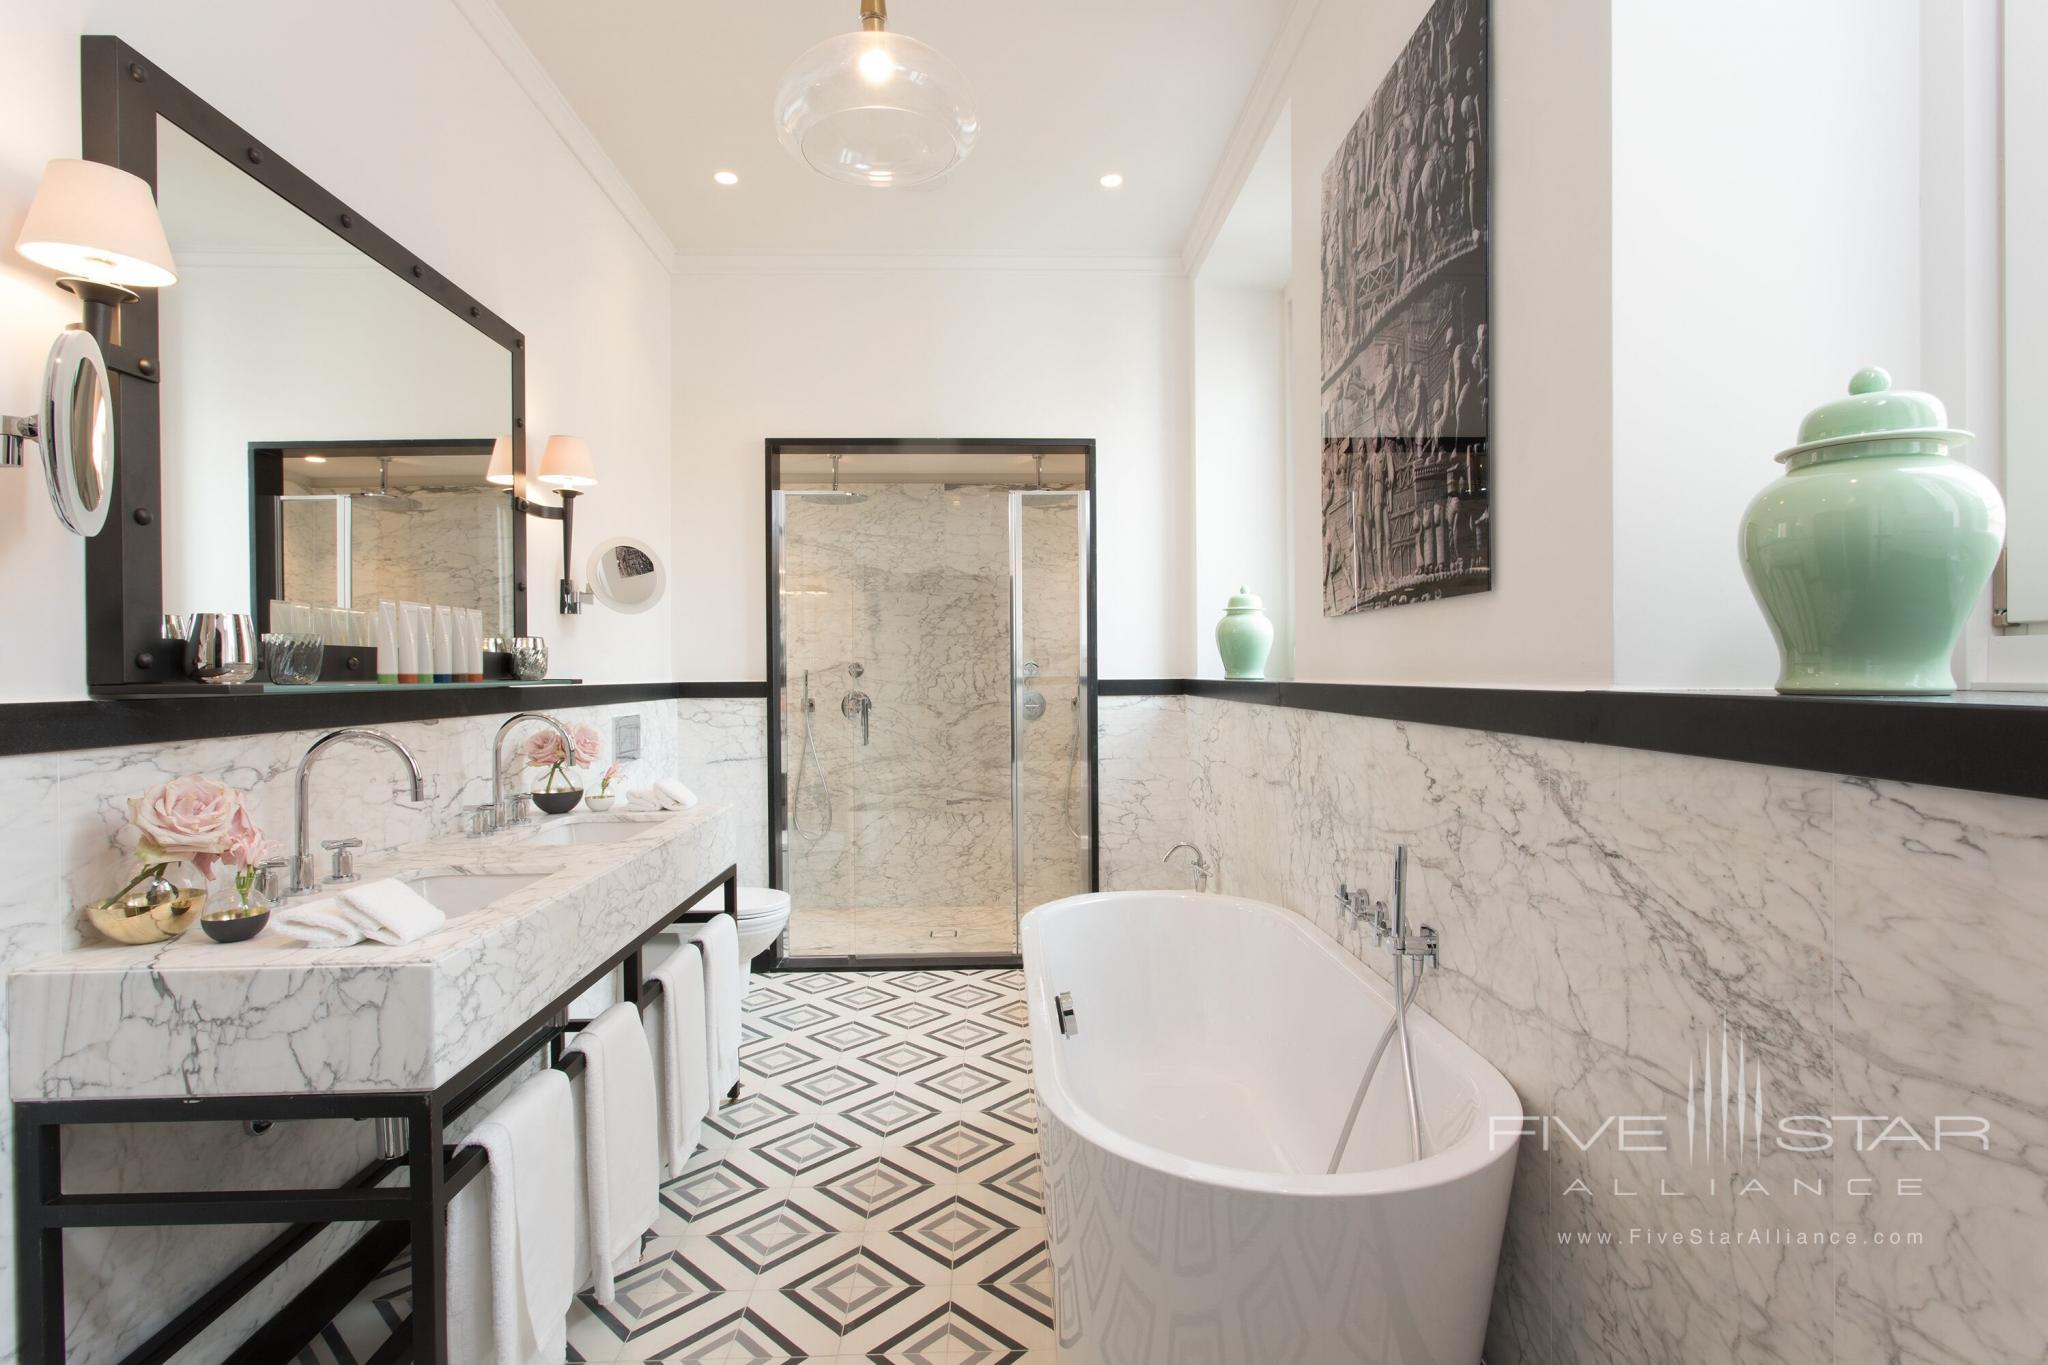 Rocco Forte House Roma Medici Suite